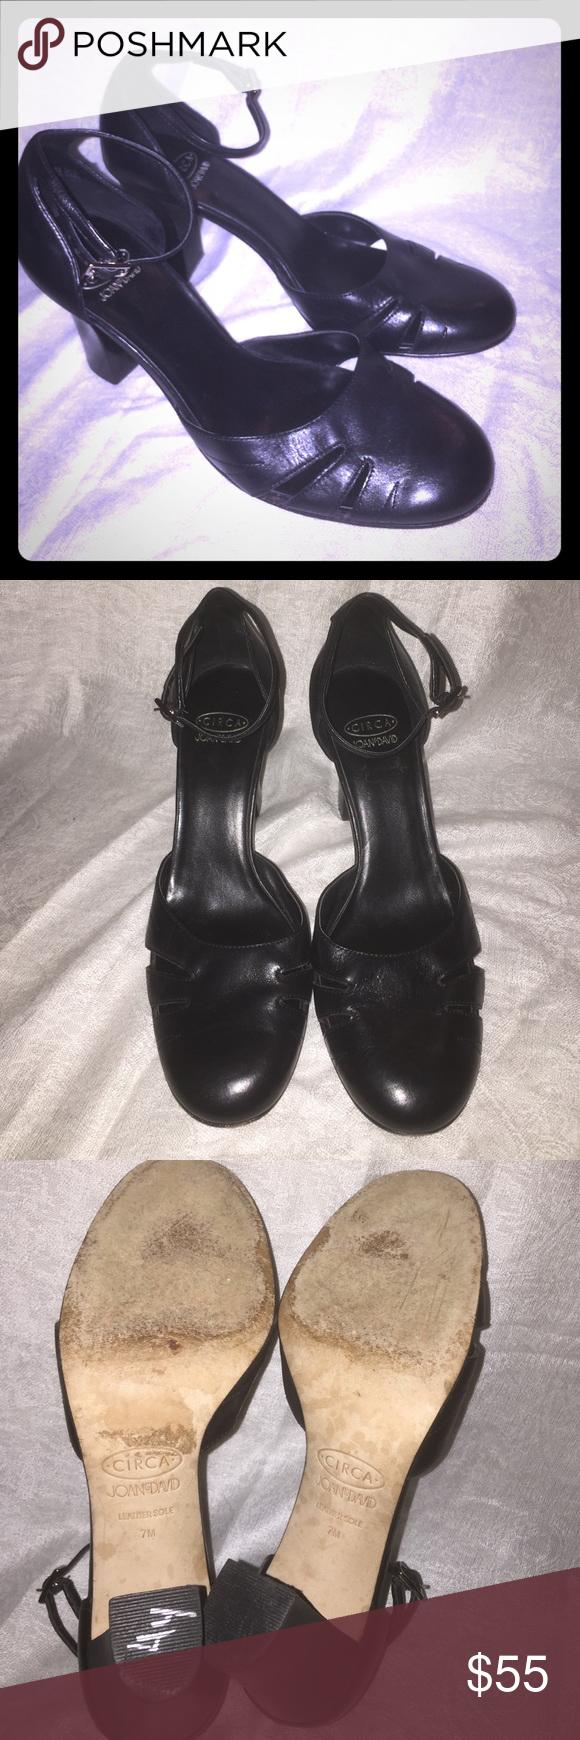 Joan & David Platforms Genuine Leather Gorgeous black Joan and David platform heels with ankle strap in good condition size 7M Joan & David Shoes Platforms